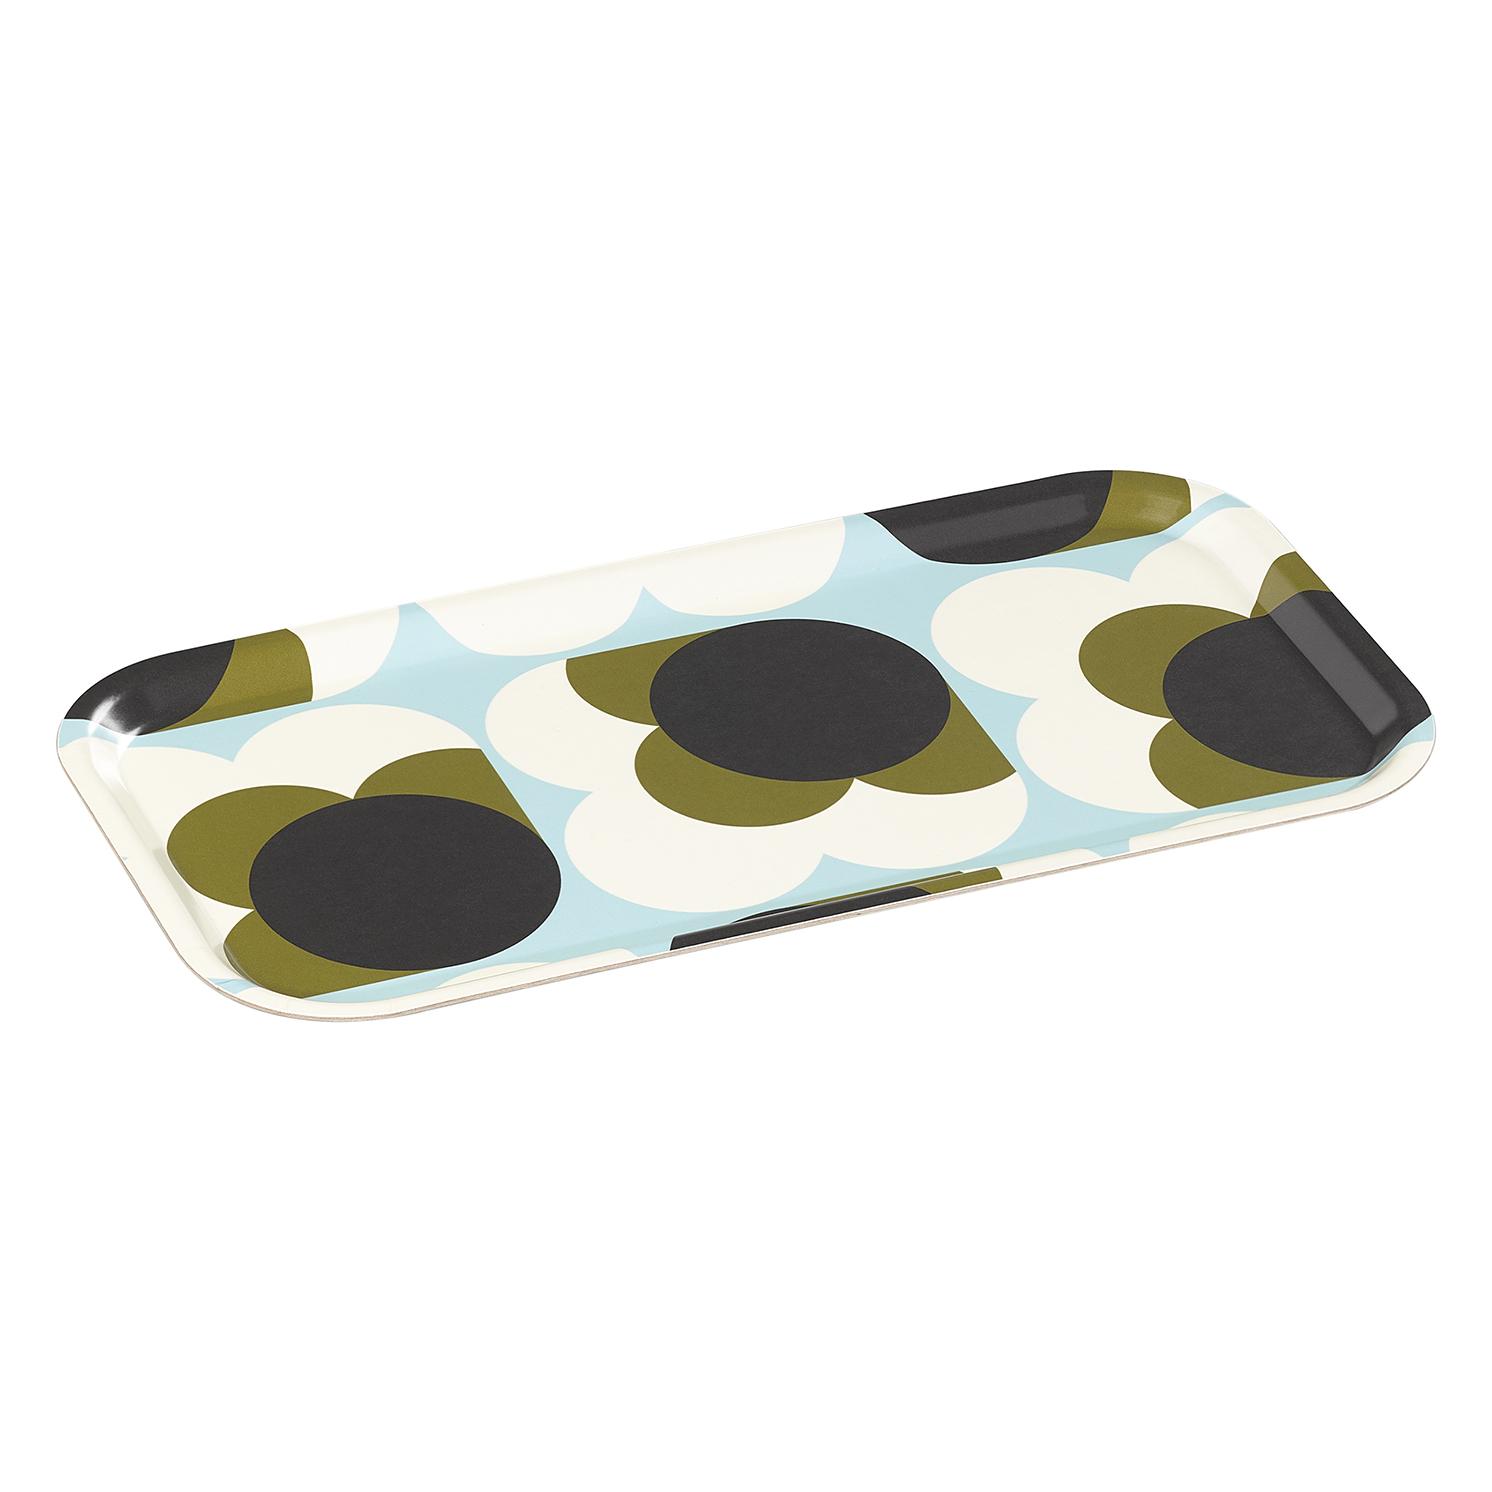 Orla Kiely – Duck Egg Blue Big Spot Shadow Flower Birch Veneer Tea Tray